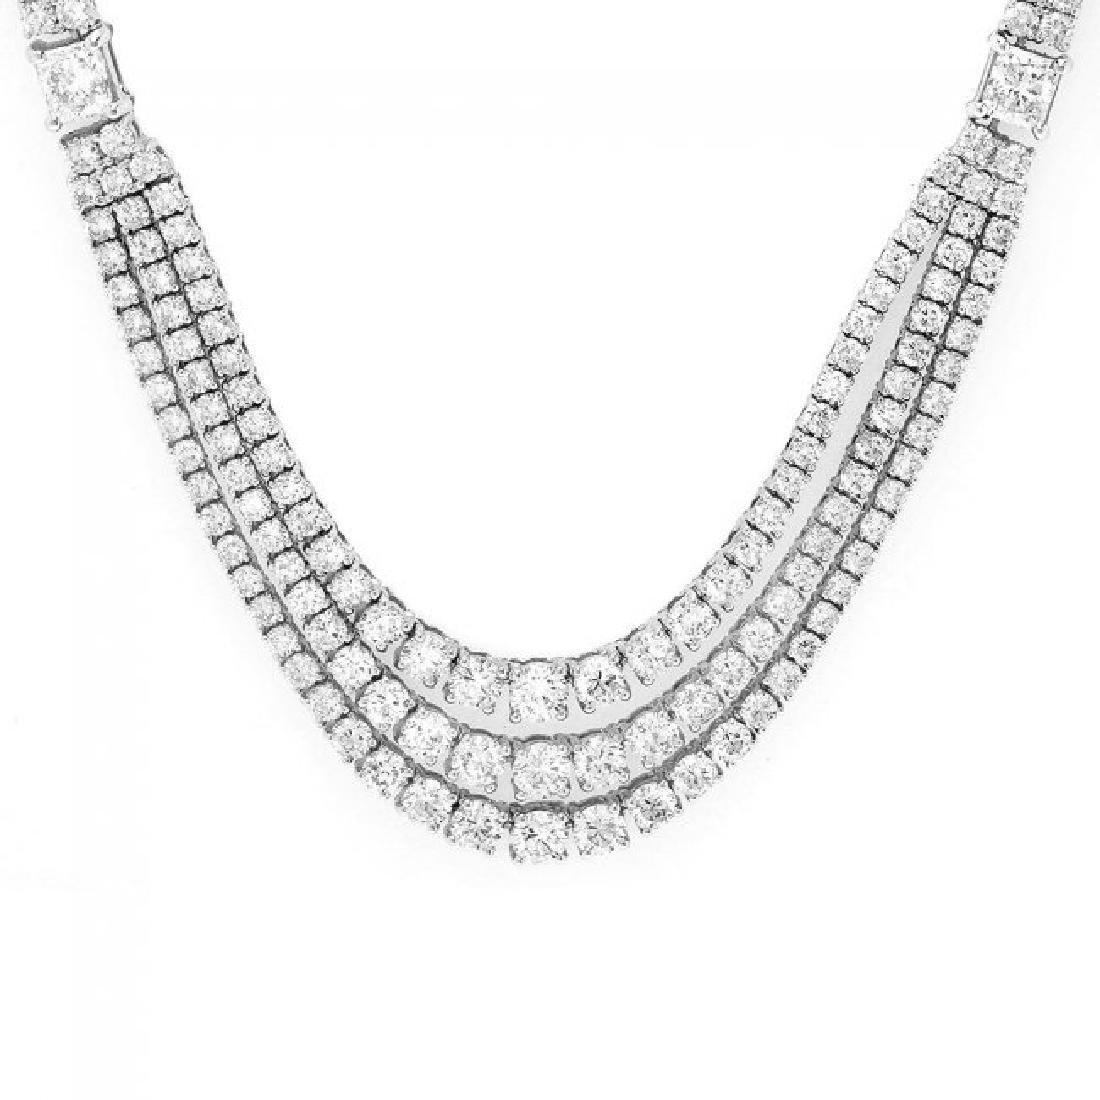 18k White Gold 23ct Diamond Necklace - 6